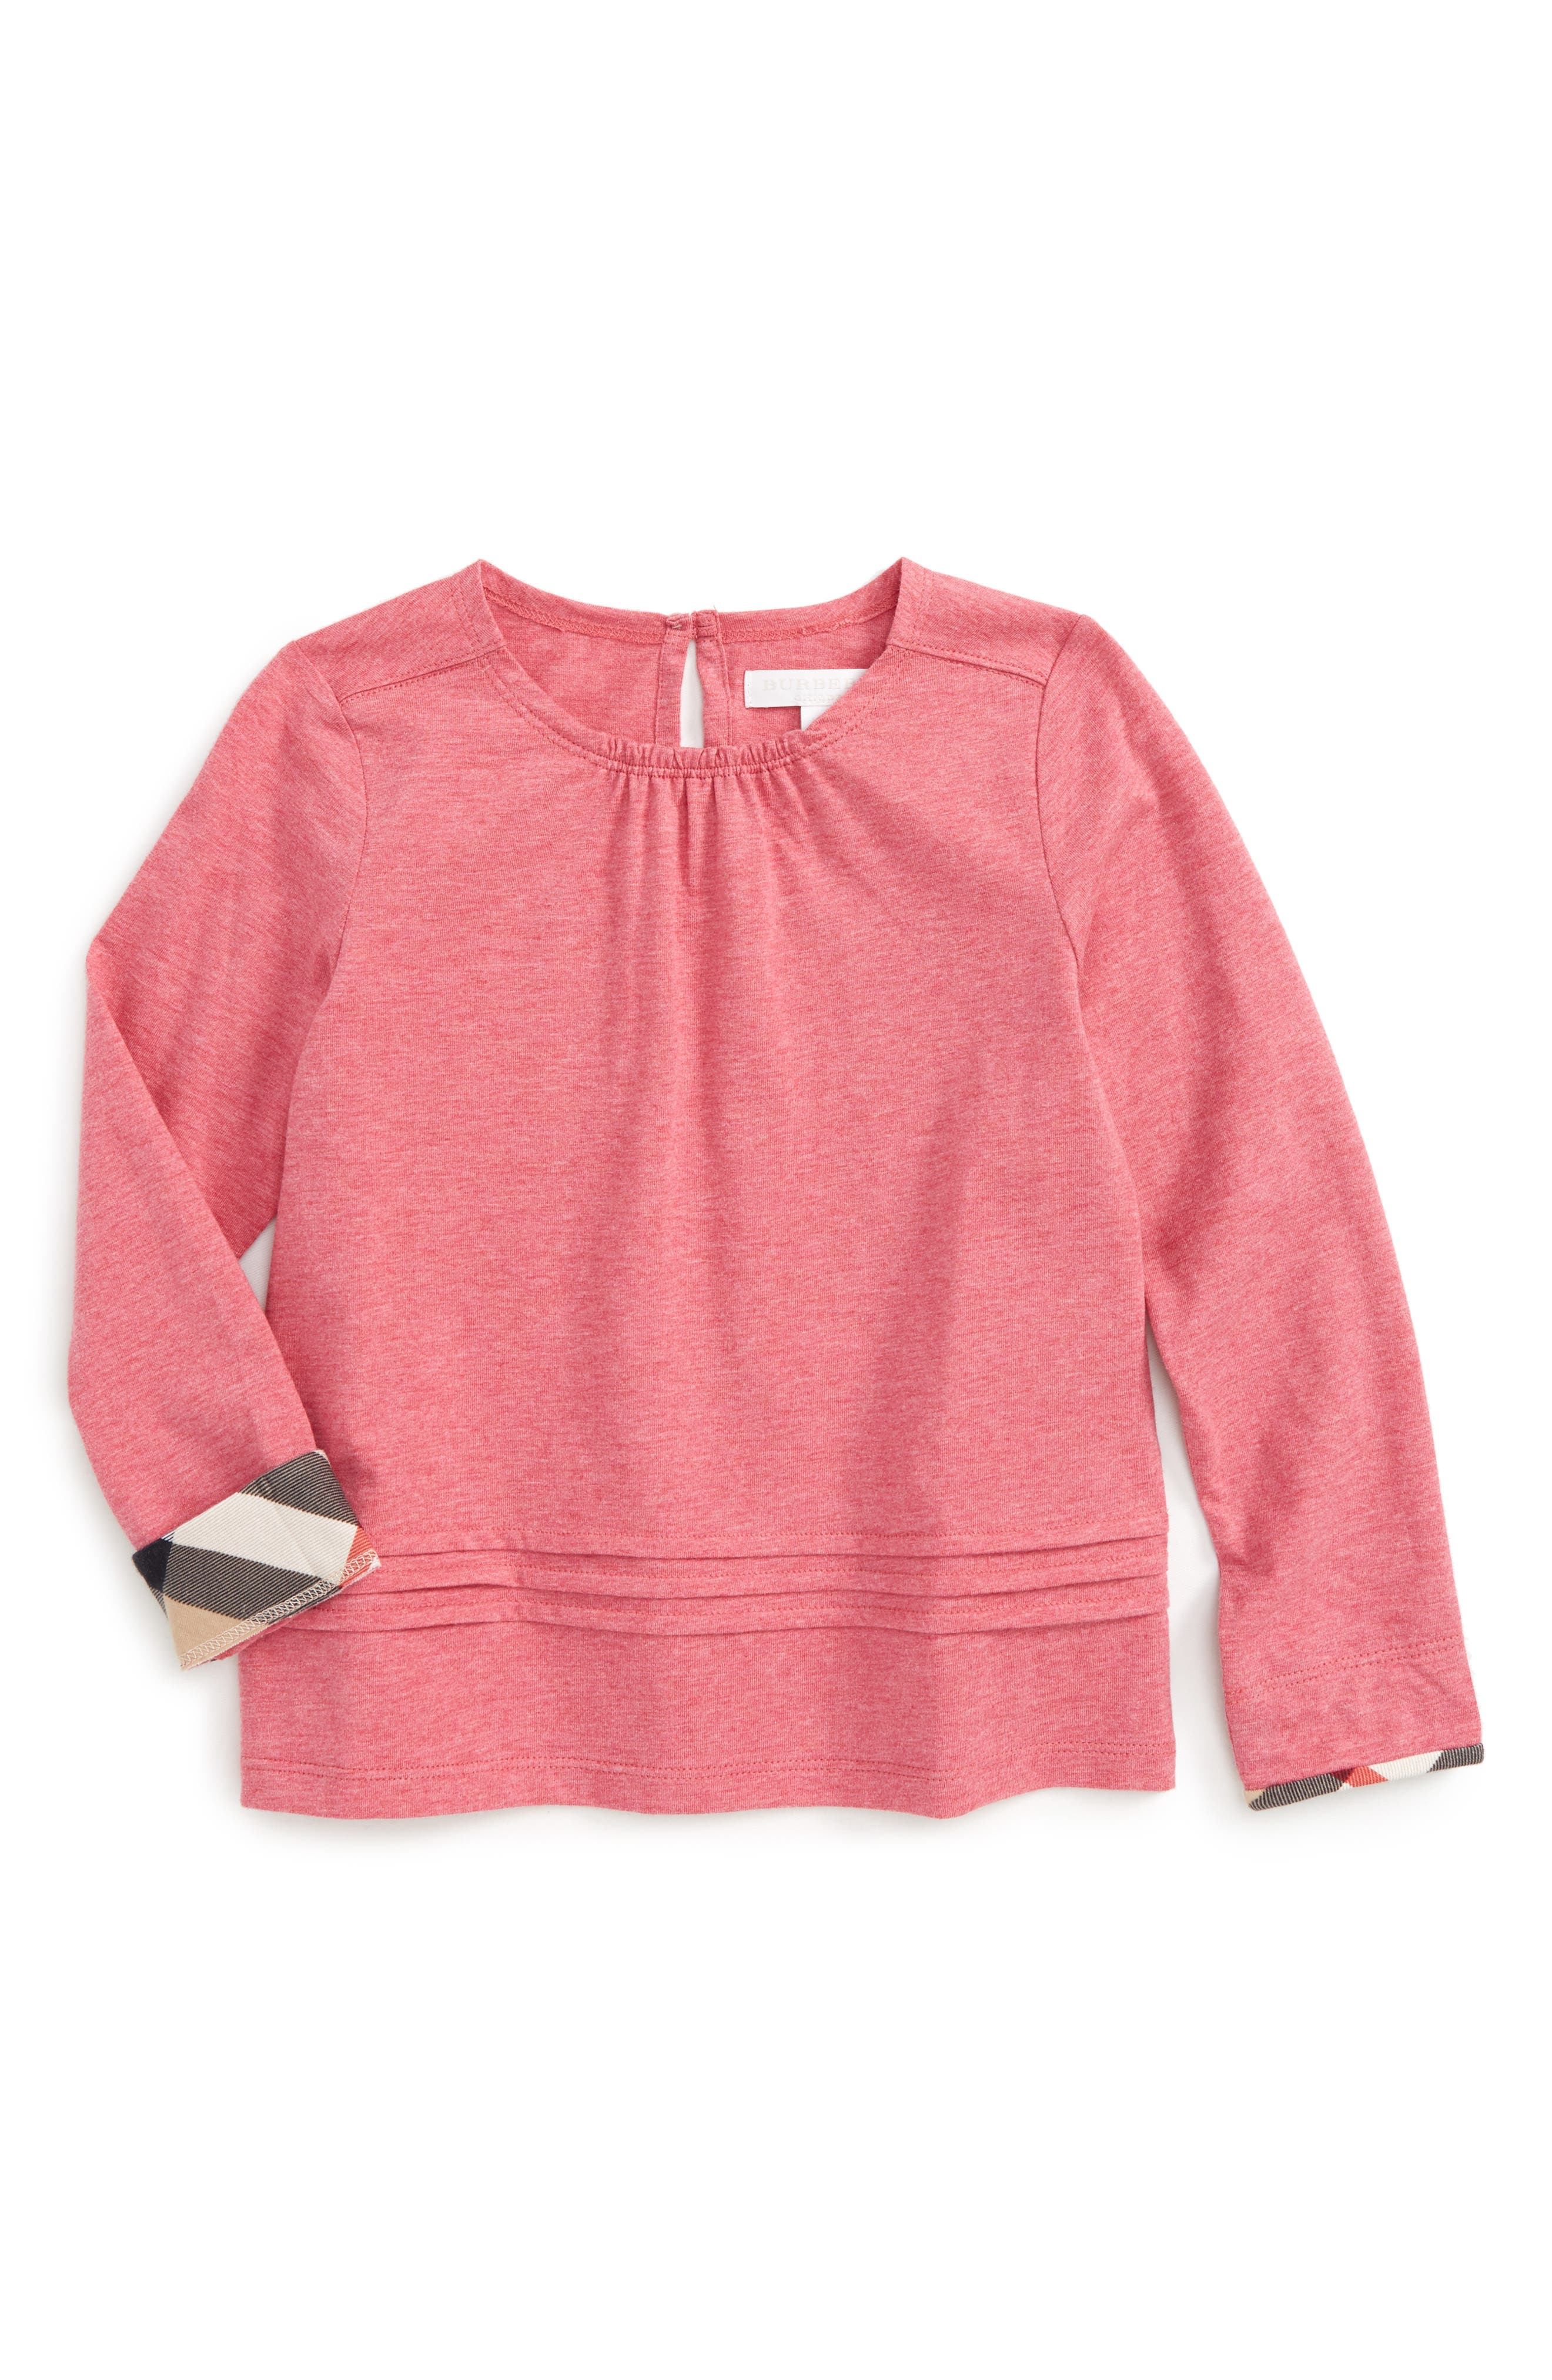 Burberry Gisselle Cotton Top (Toddler Girls, Little Girls & Big Girls)